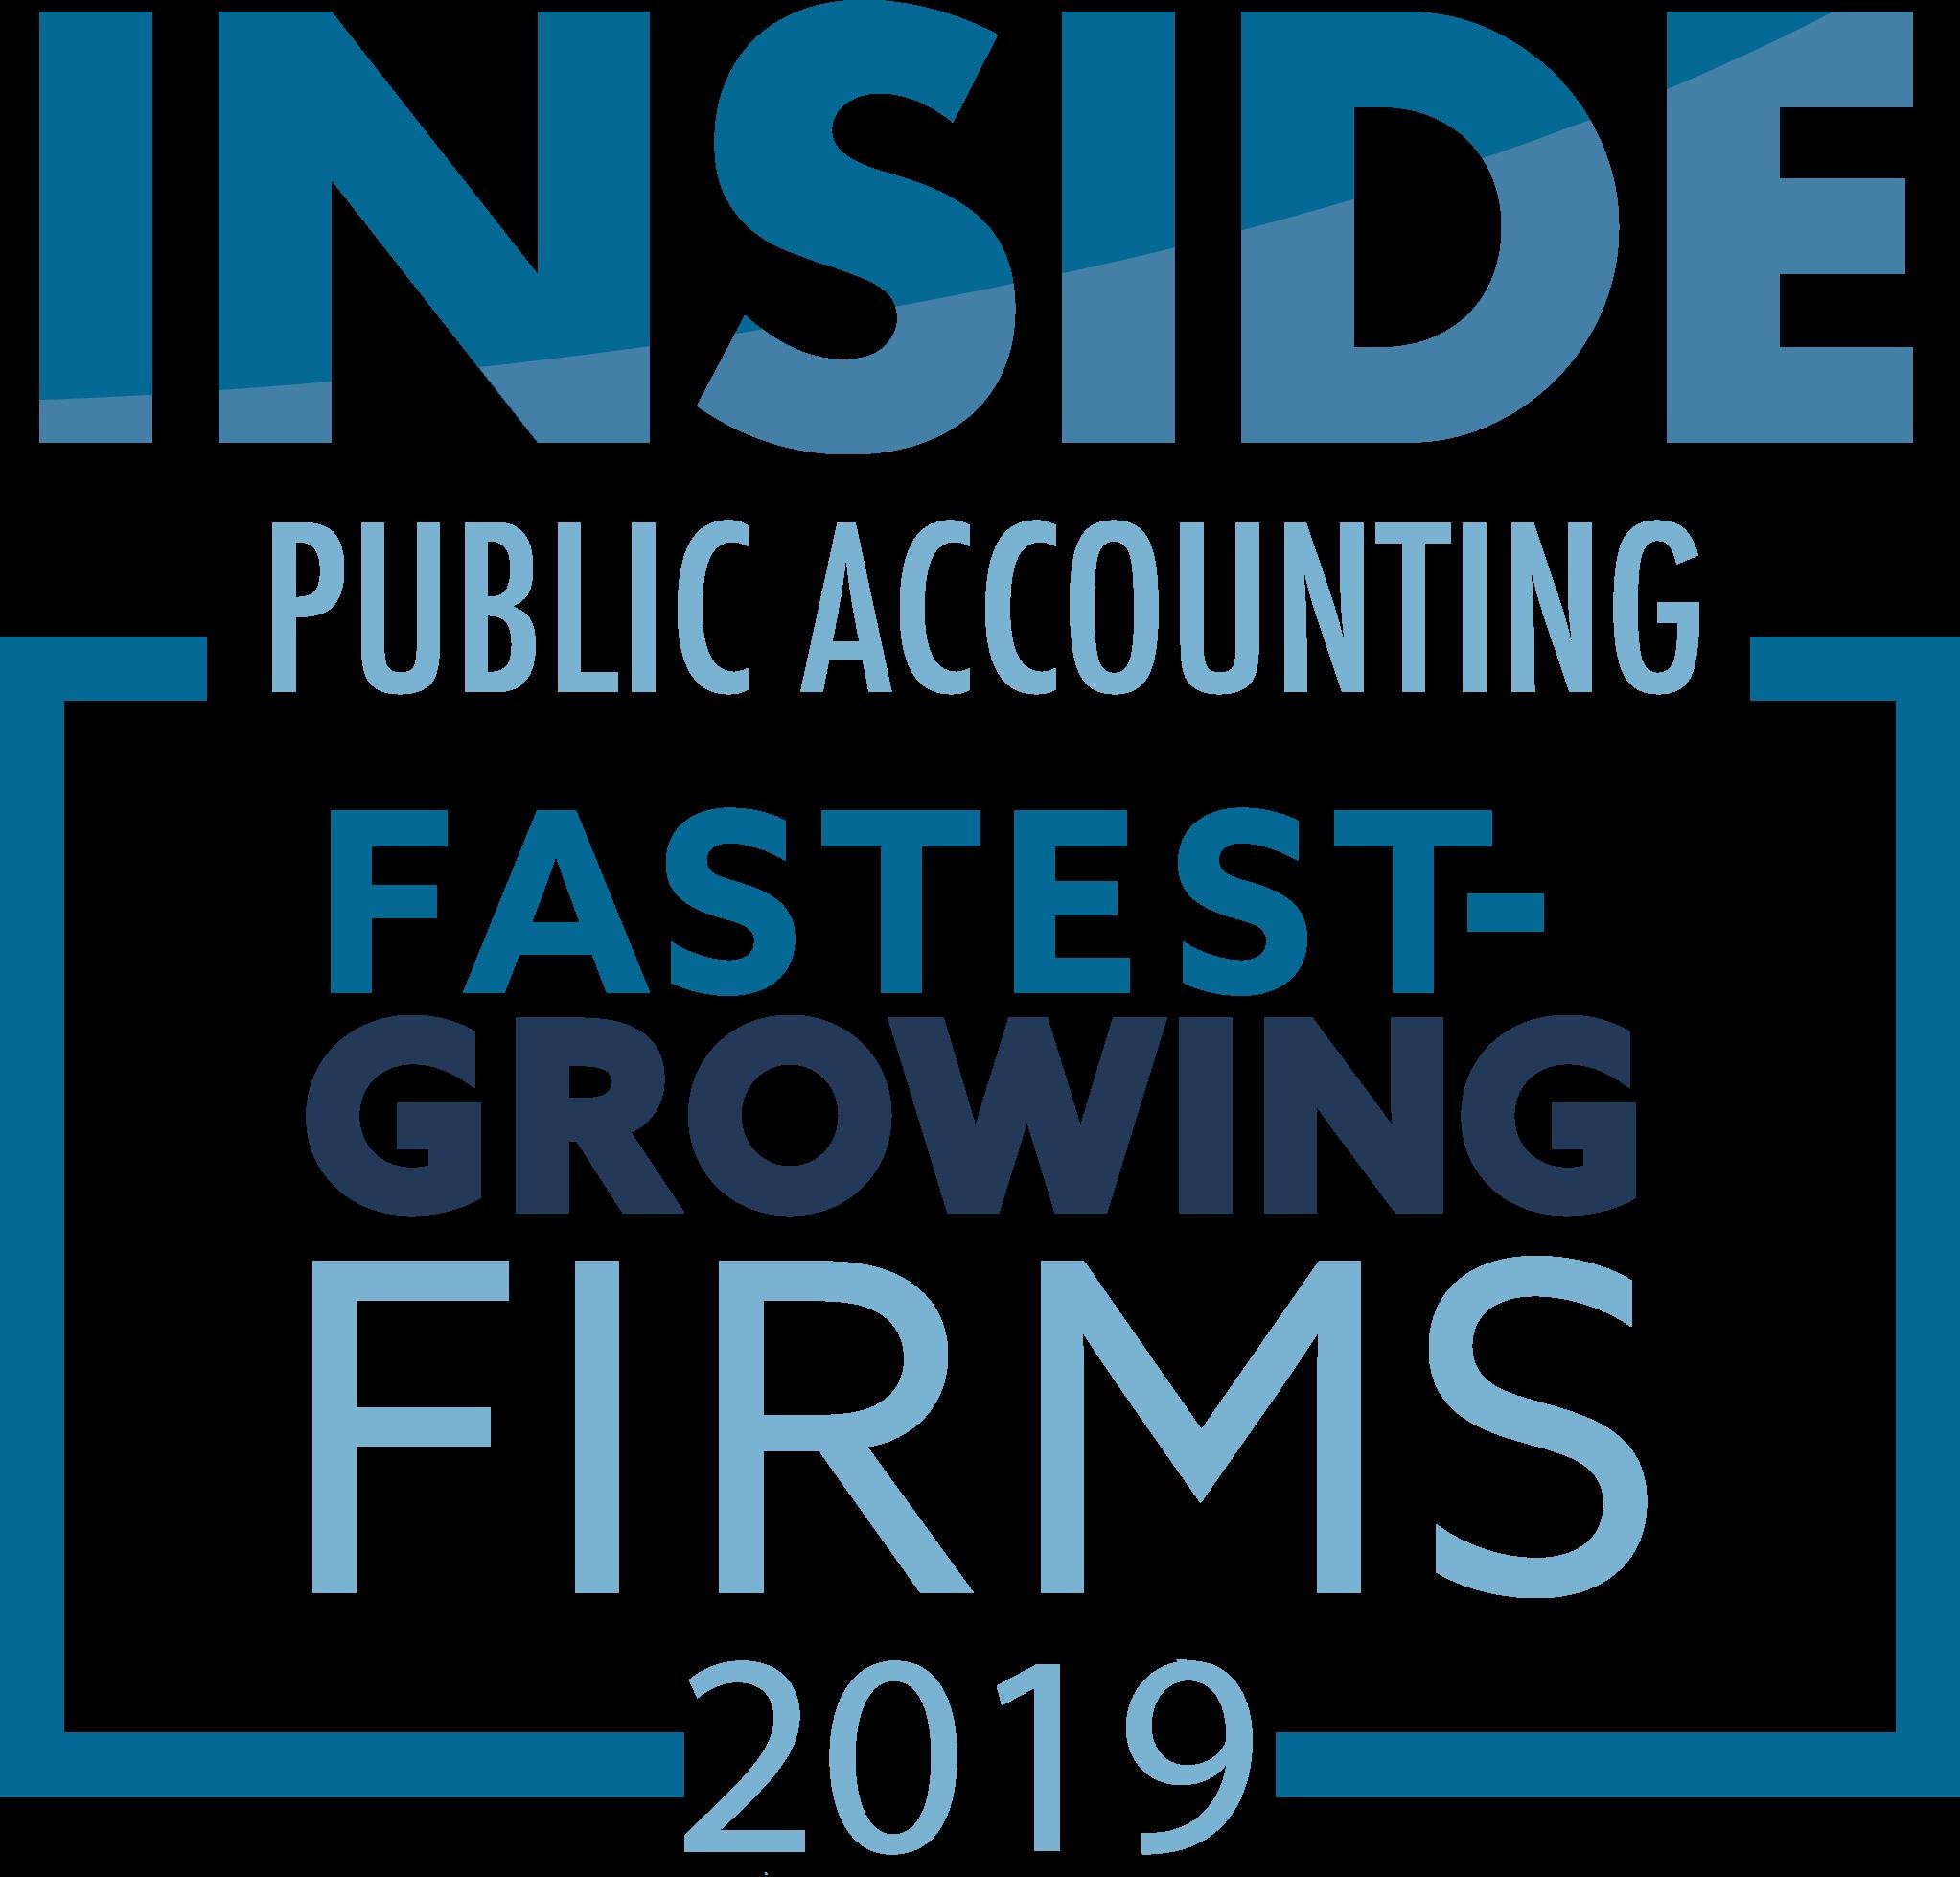 Award- 2019 Fastest Growing Firms